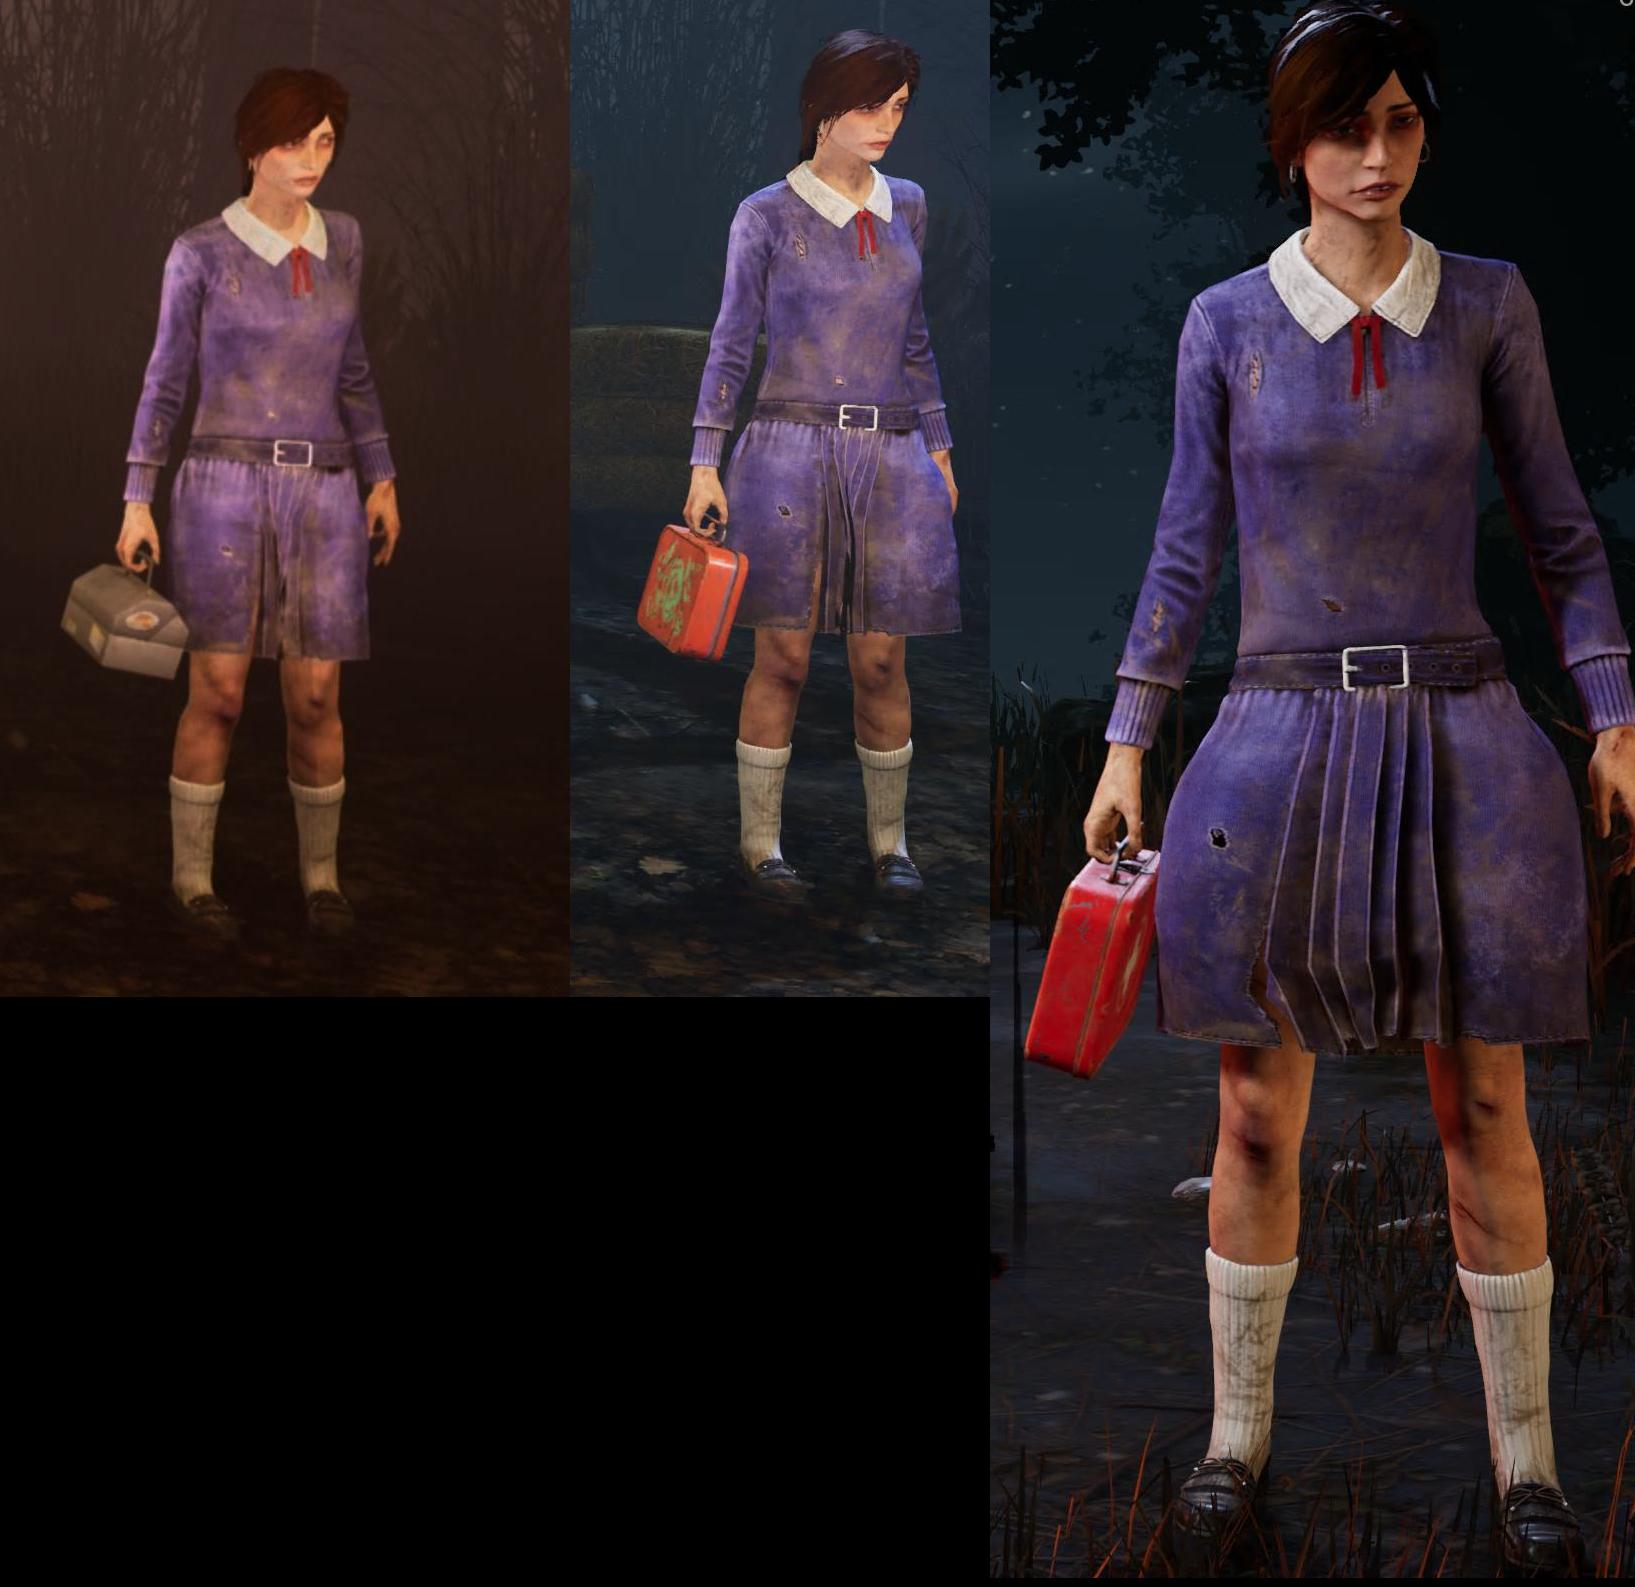 skirt2.png